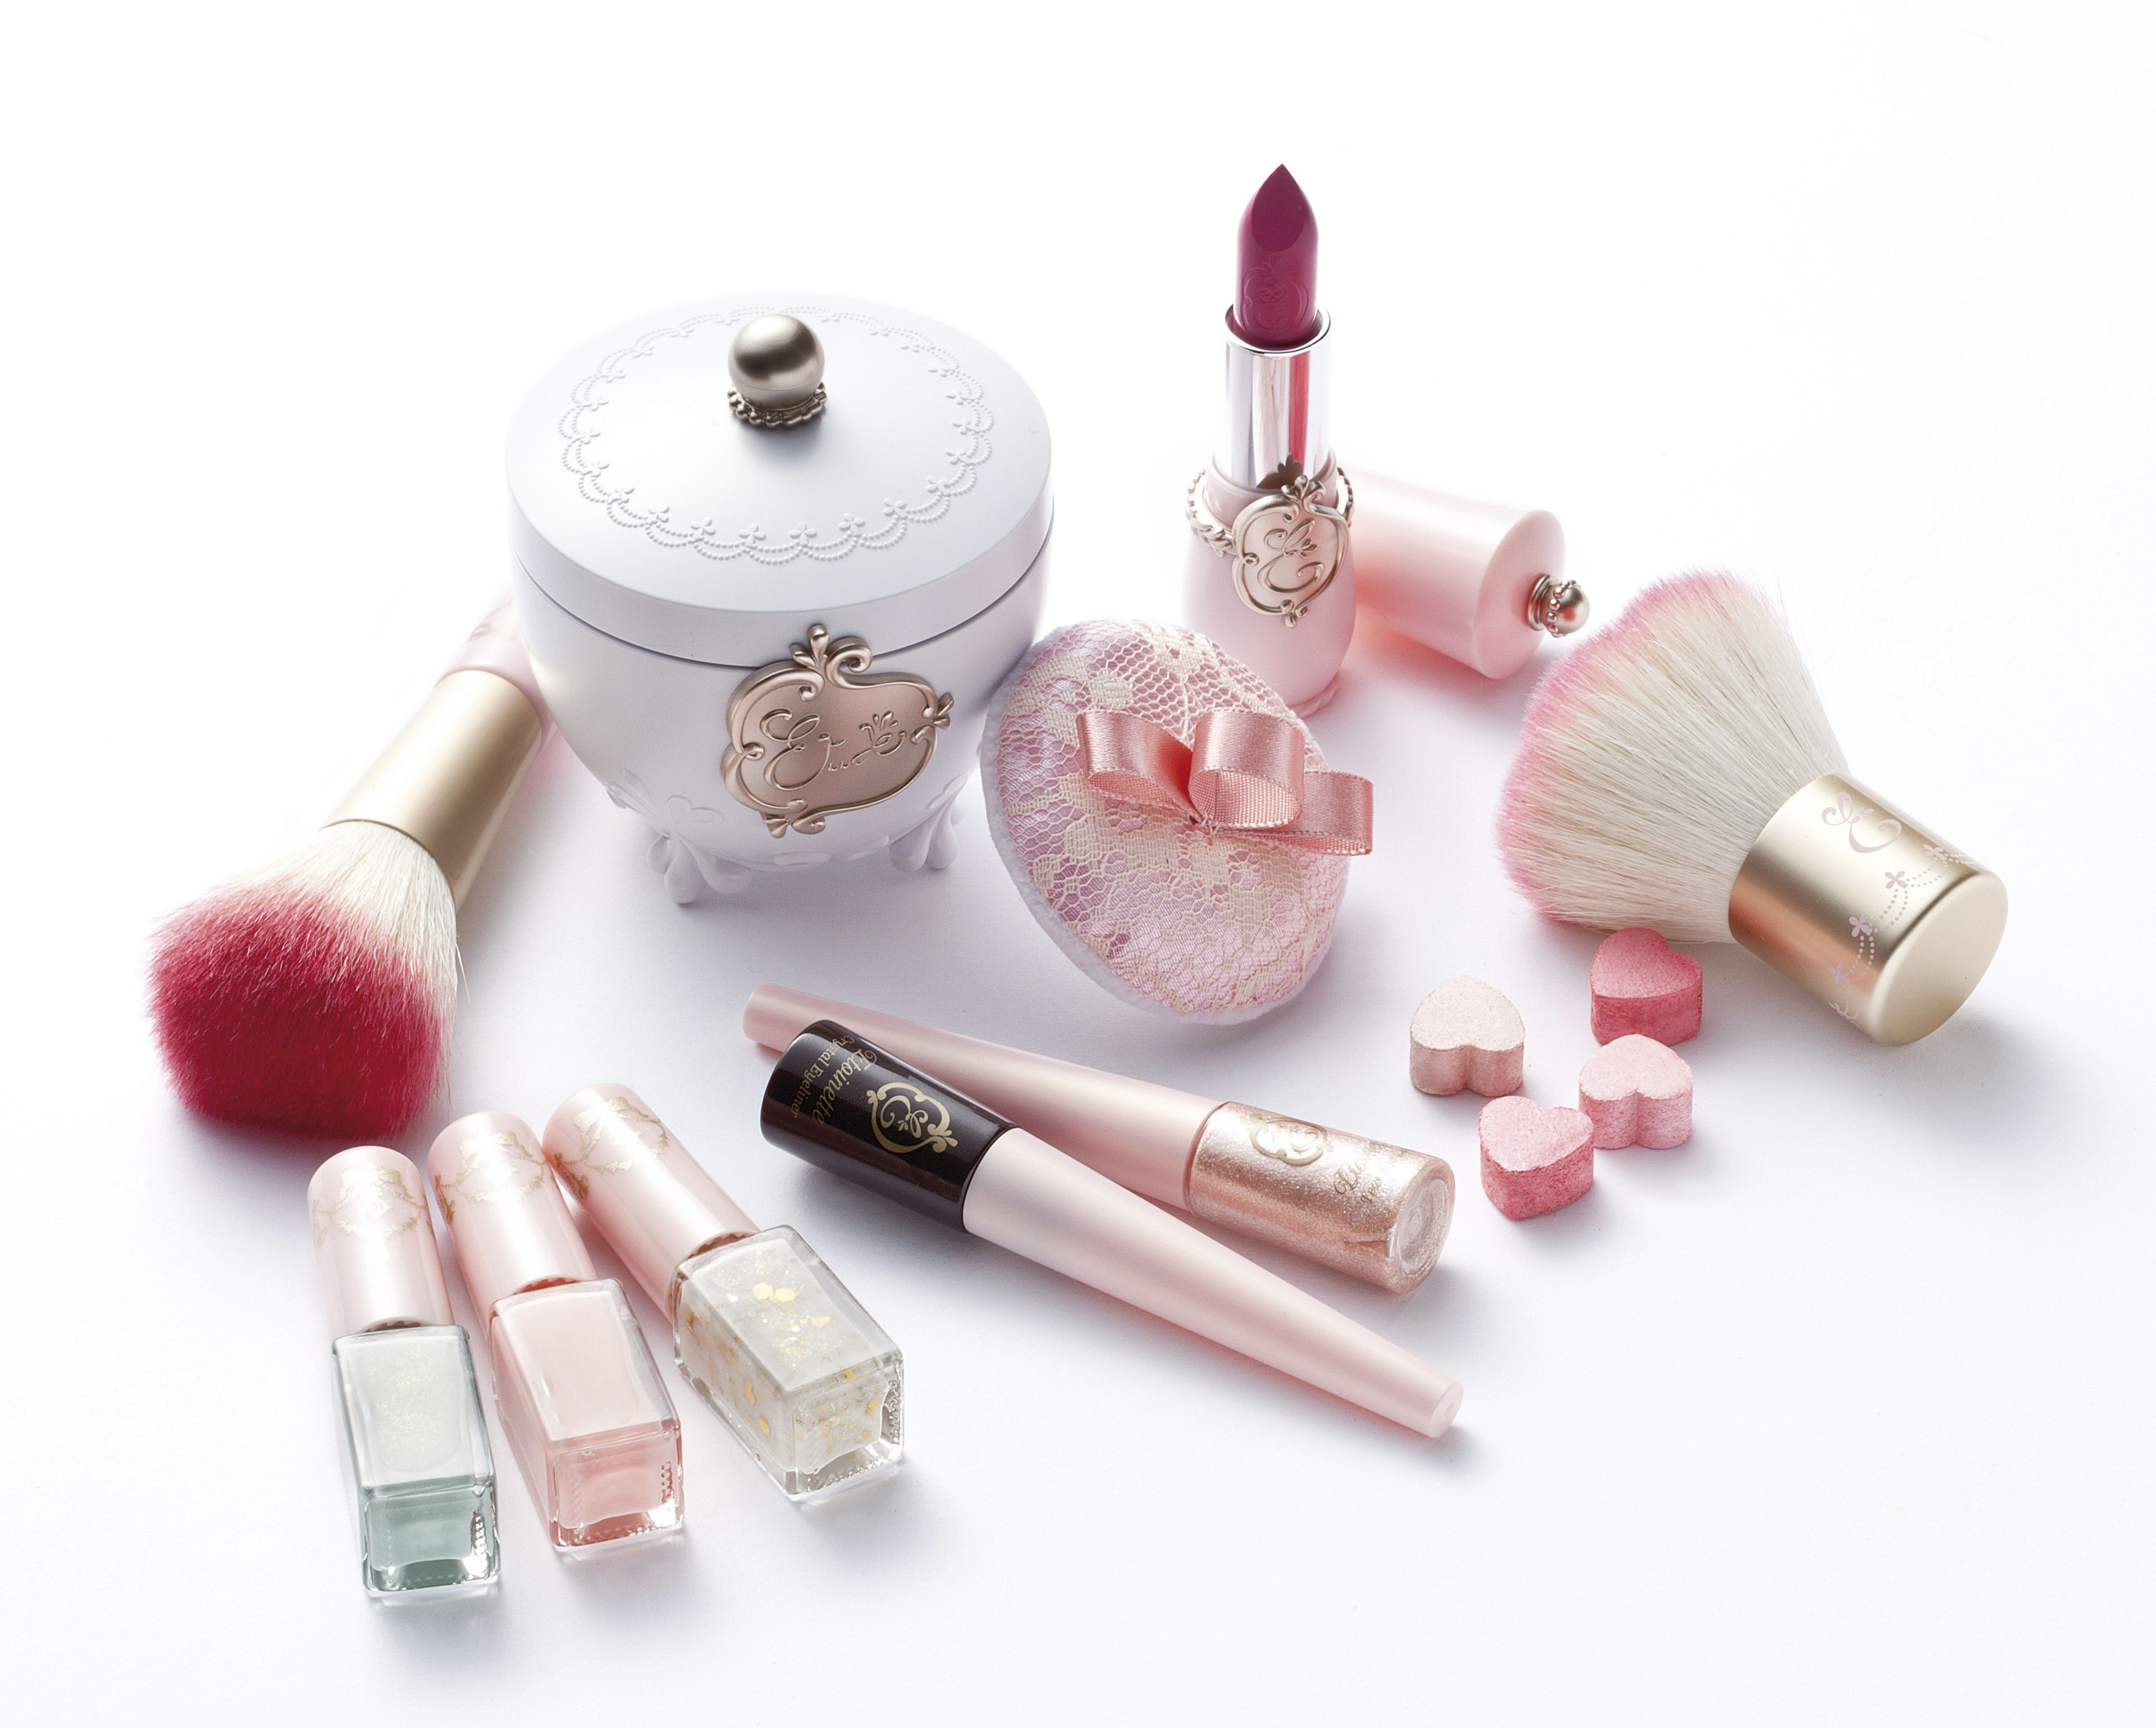 Etude House Cosmetics brands, Etude house, Makeup package